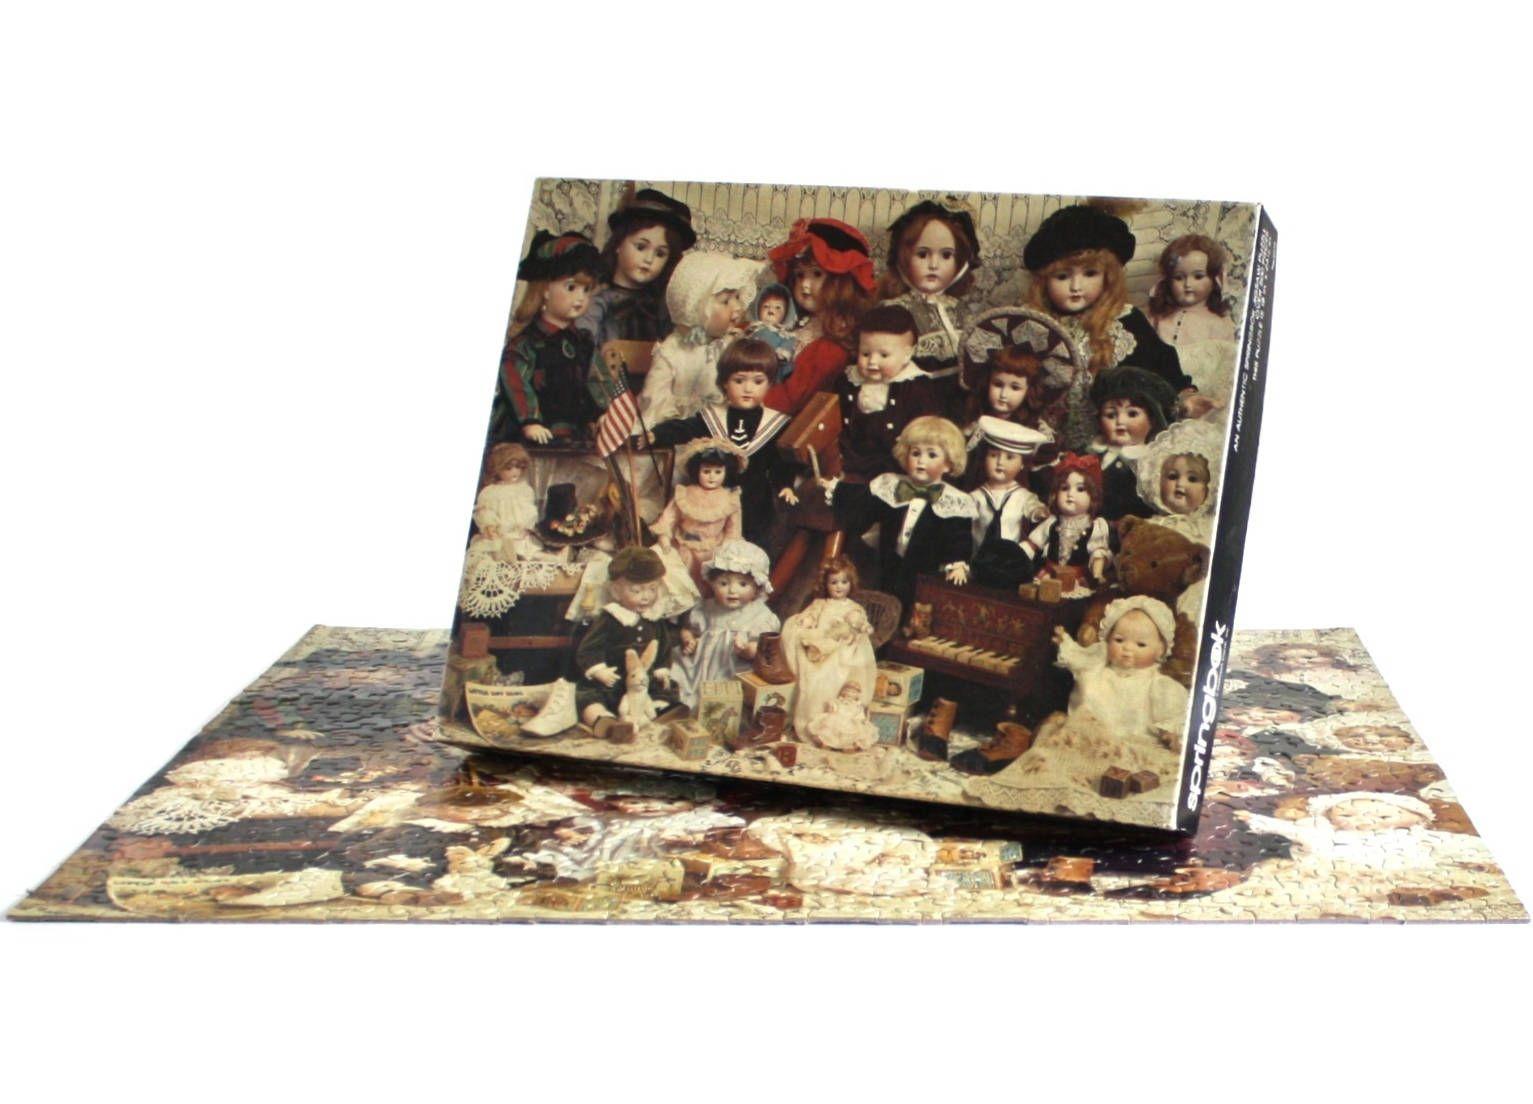 Marjolein Bastin Puzzle, Springbok 500 Pieces